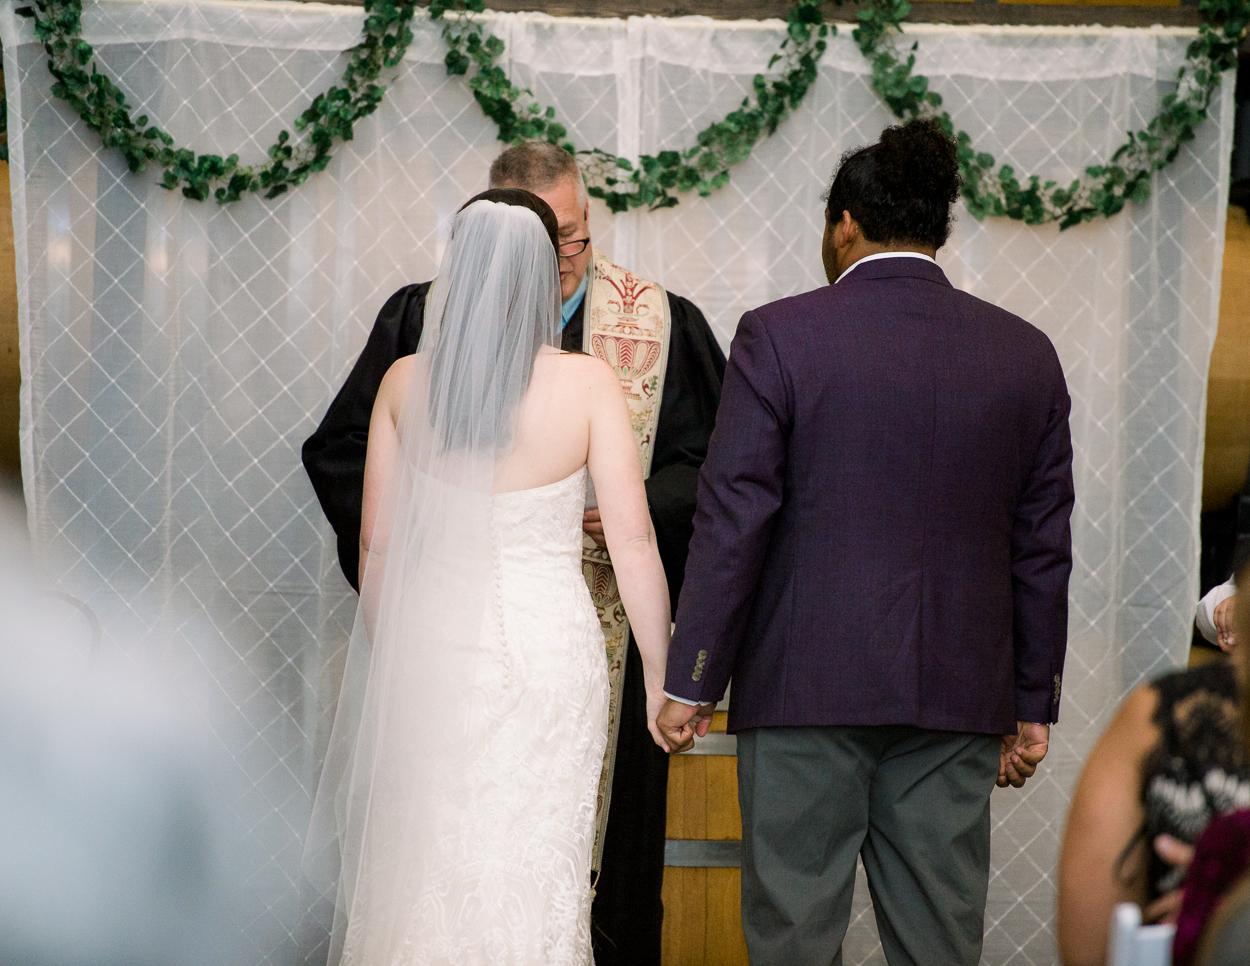 BigCork_vineyard wedding_virginiaweddingphotographer_youseephotography_SarahJames (78).JPG